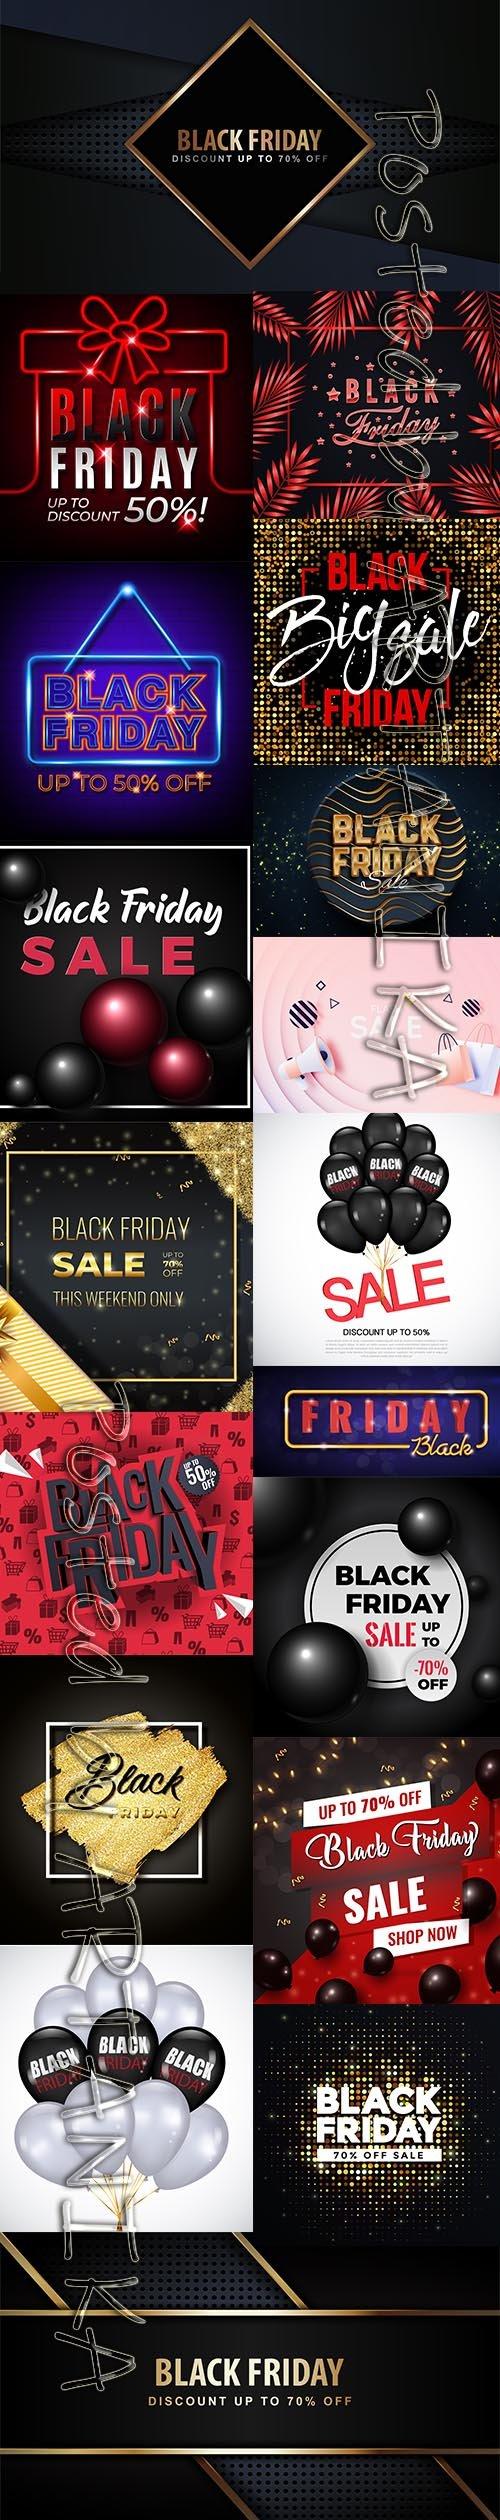 Black Friday Sale Backgrounds Vol 3